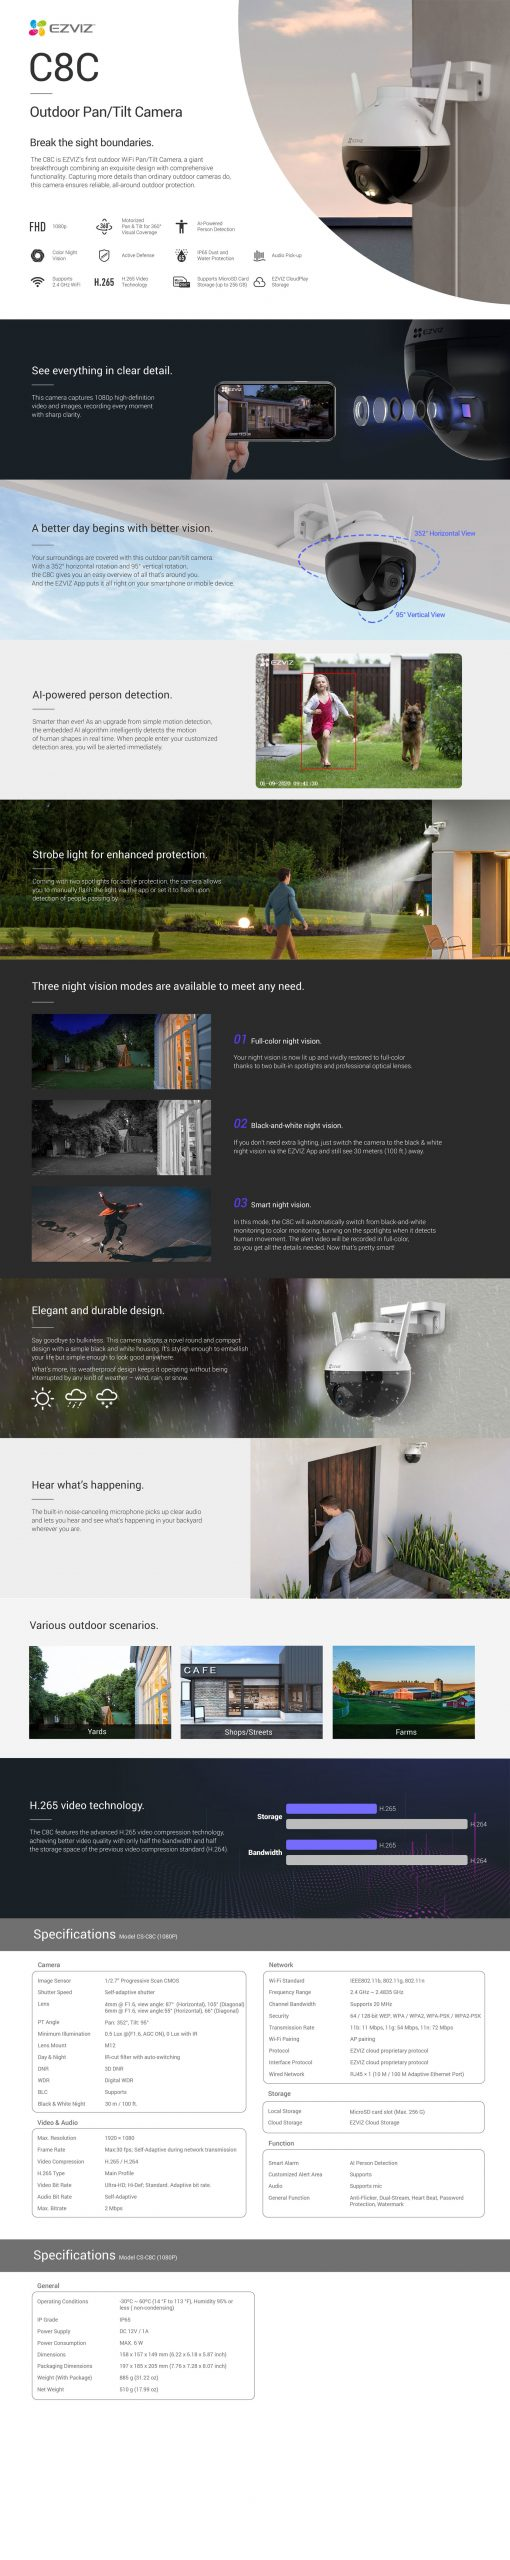 EZVIZ Outdoor Smart Wi-Fi Camera (CS-C8C-A0-1F2WFL1)